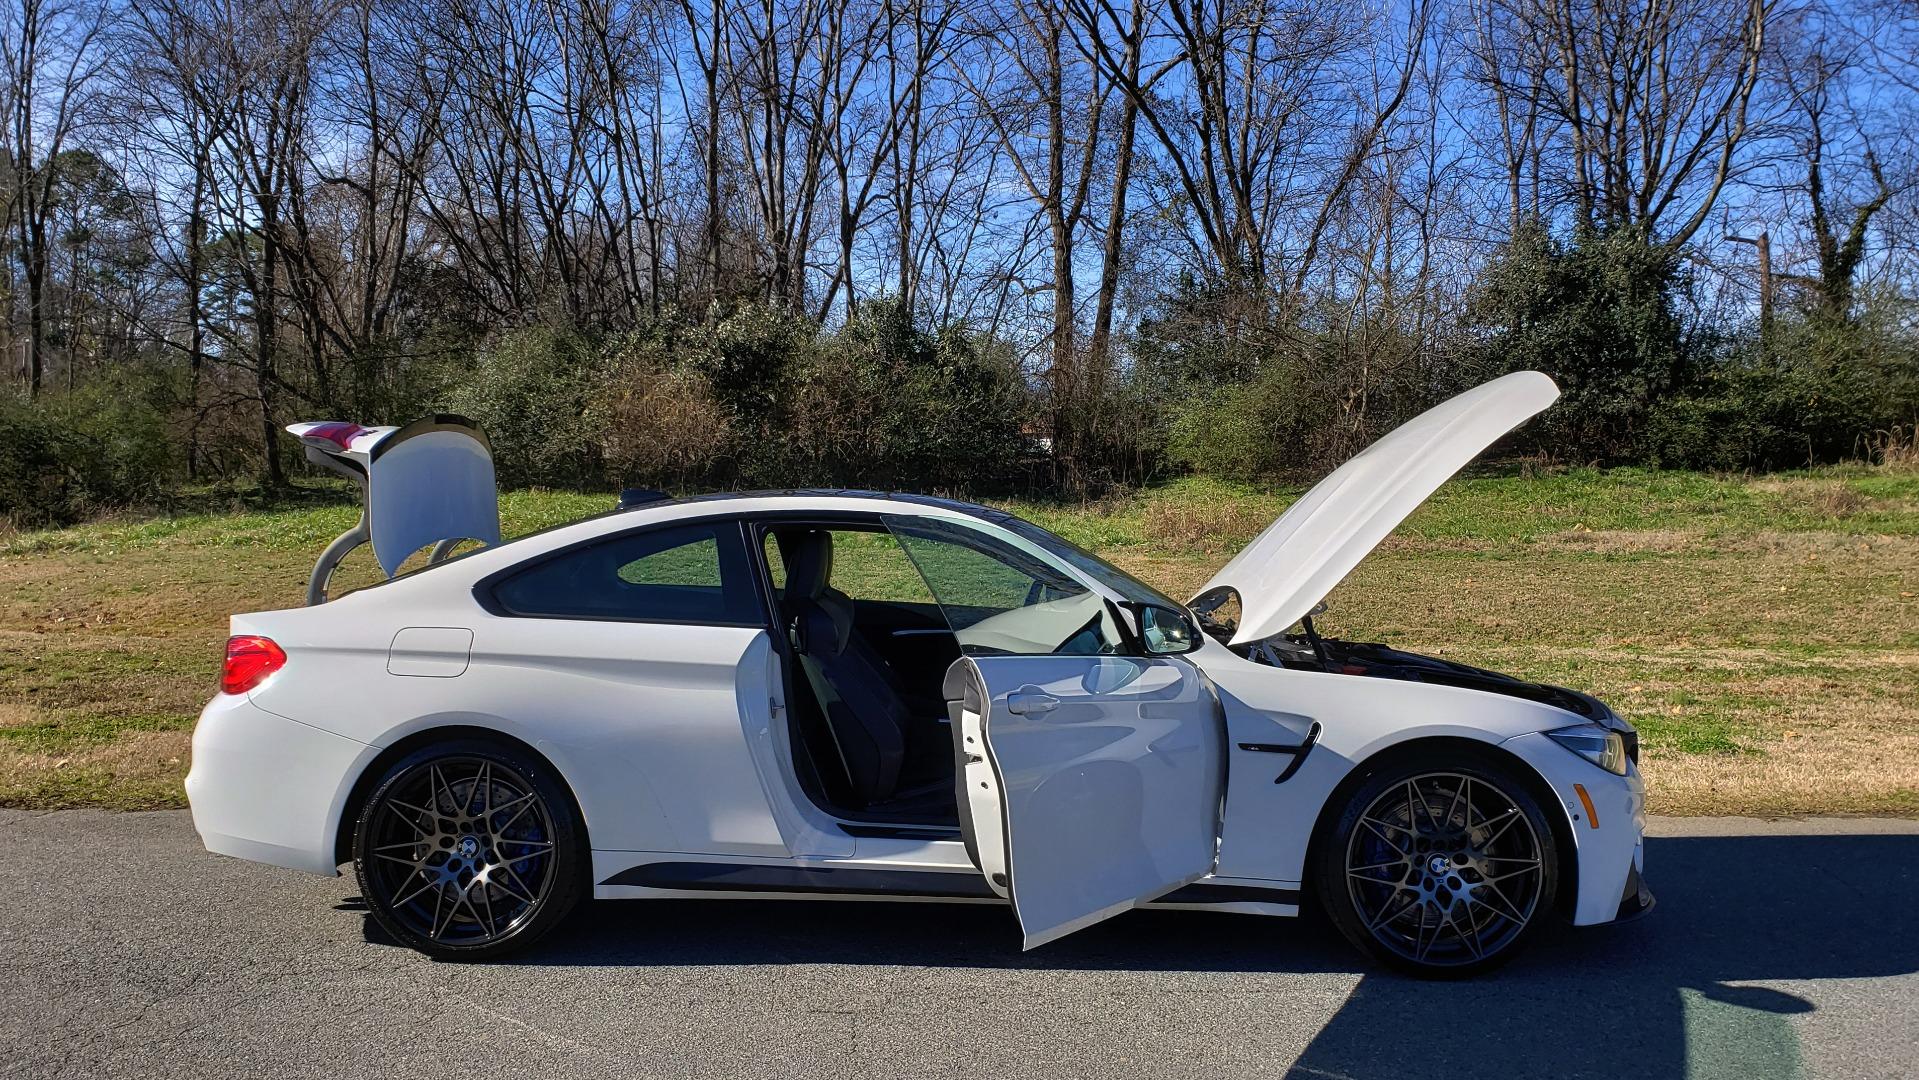 Used 2018 BMW M4 COMP PKG / EXEC / M-DRIVER / PARK CNTRL / ACTIVE BLIND SPOT for sale Sold at Formula Imports in Charlotte NC 28227 18